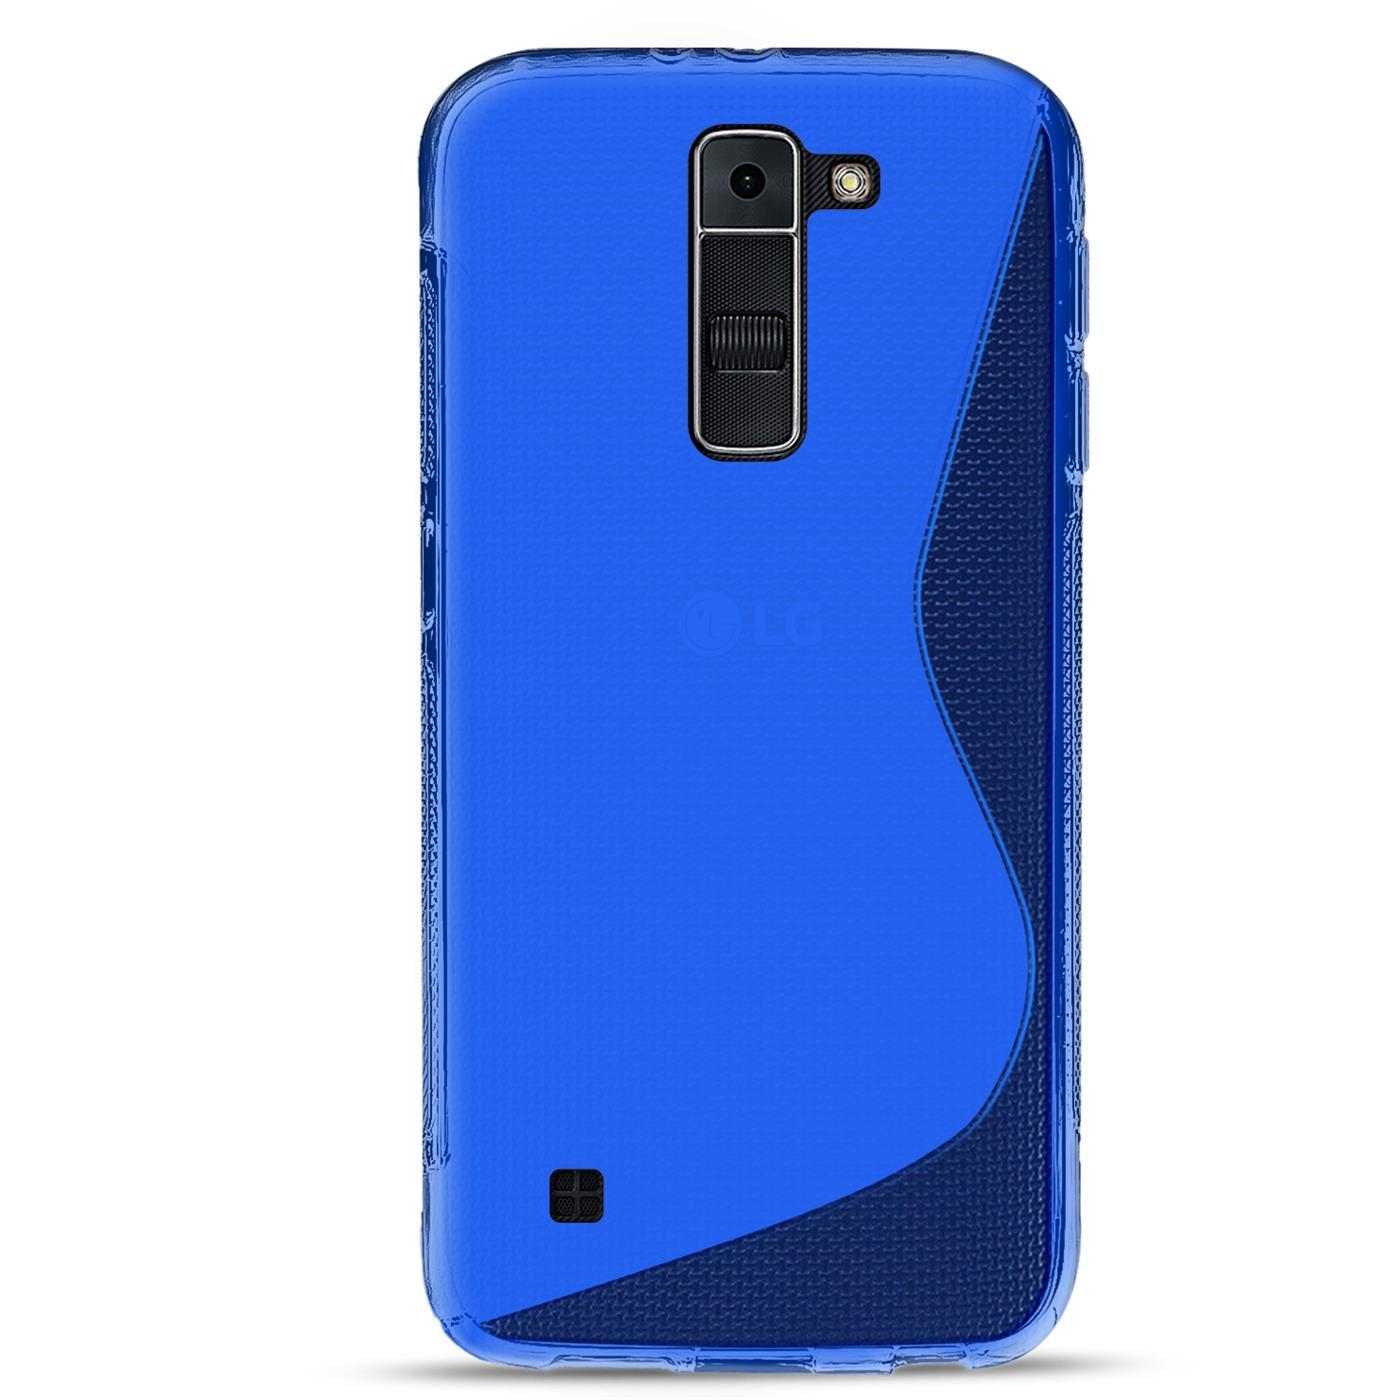 LG-Leon-LTE-Silikon-Gel-S-Line-Case-Cover-Ultra-Thin-Slim-Back-Bumper Indexbild 8